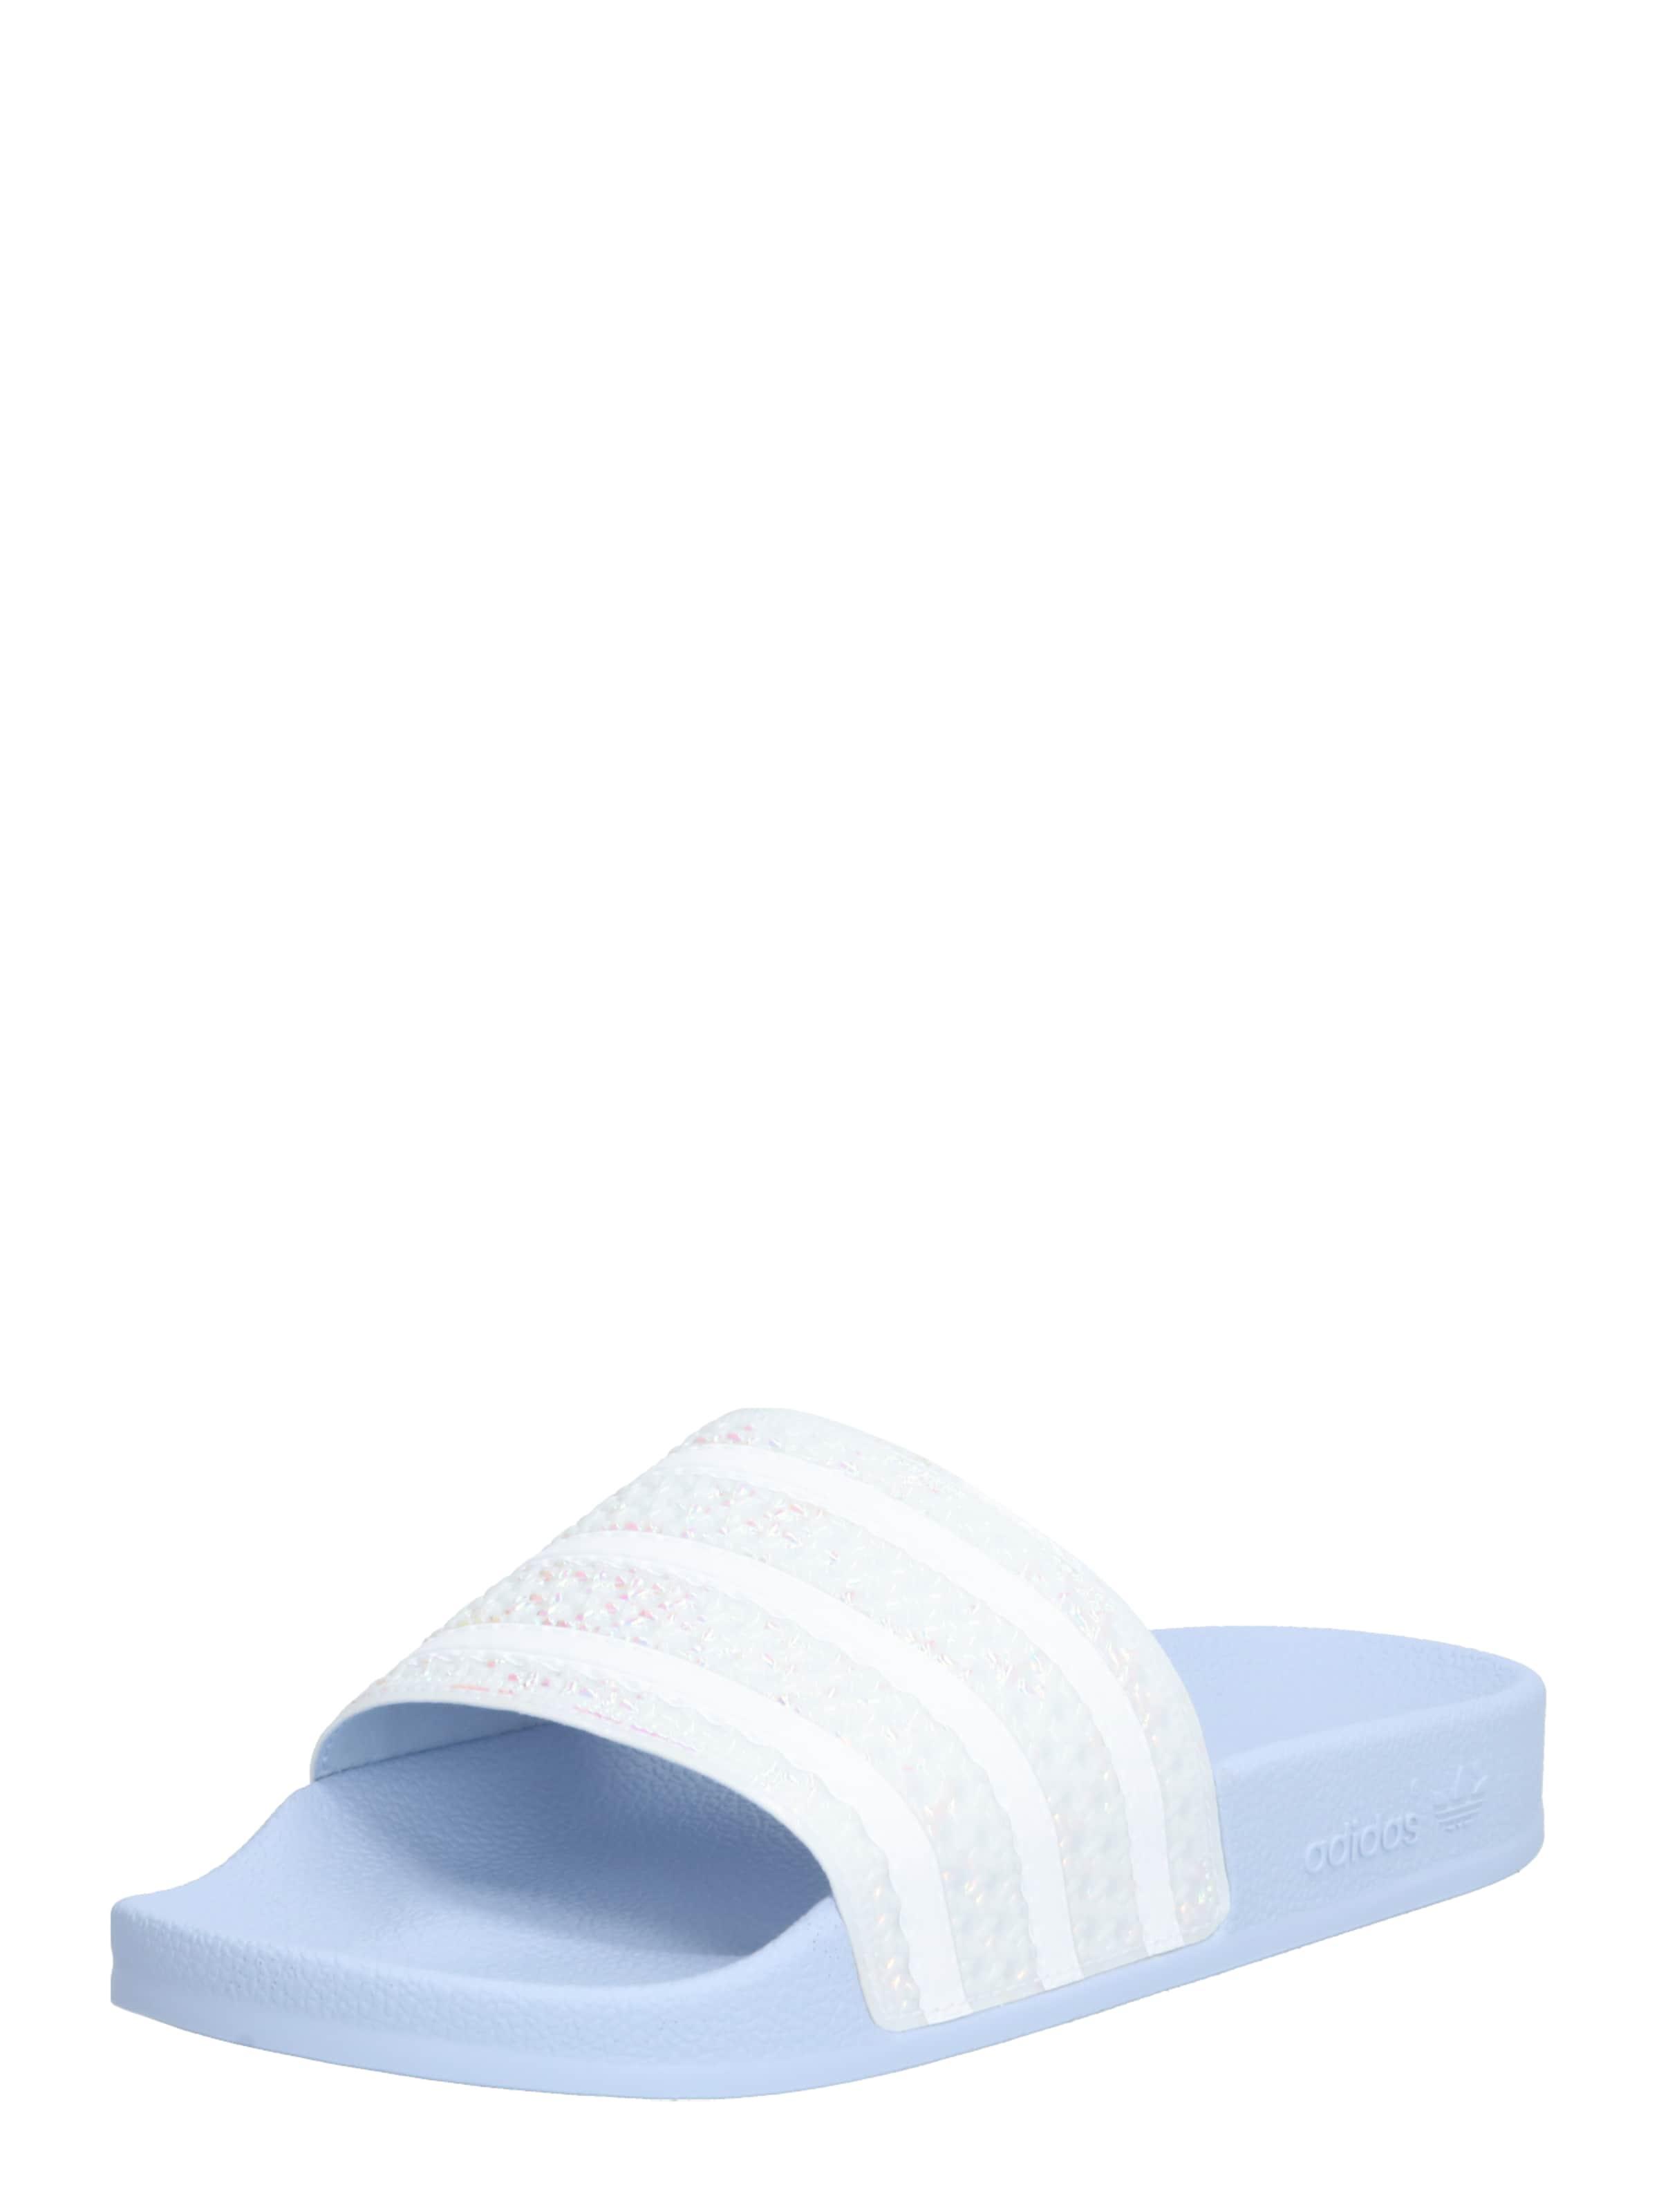 Originals SchwarzWeiß Badesandale Adidas 'adilette' In Rj345AL